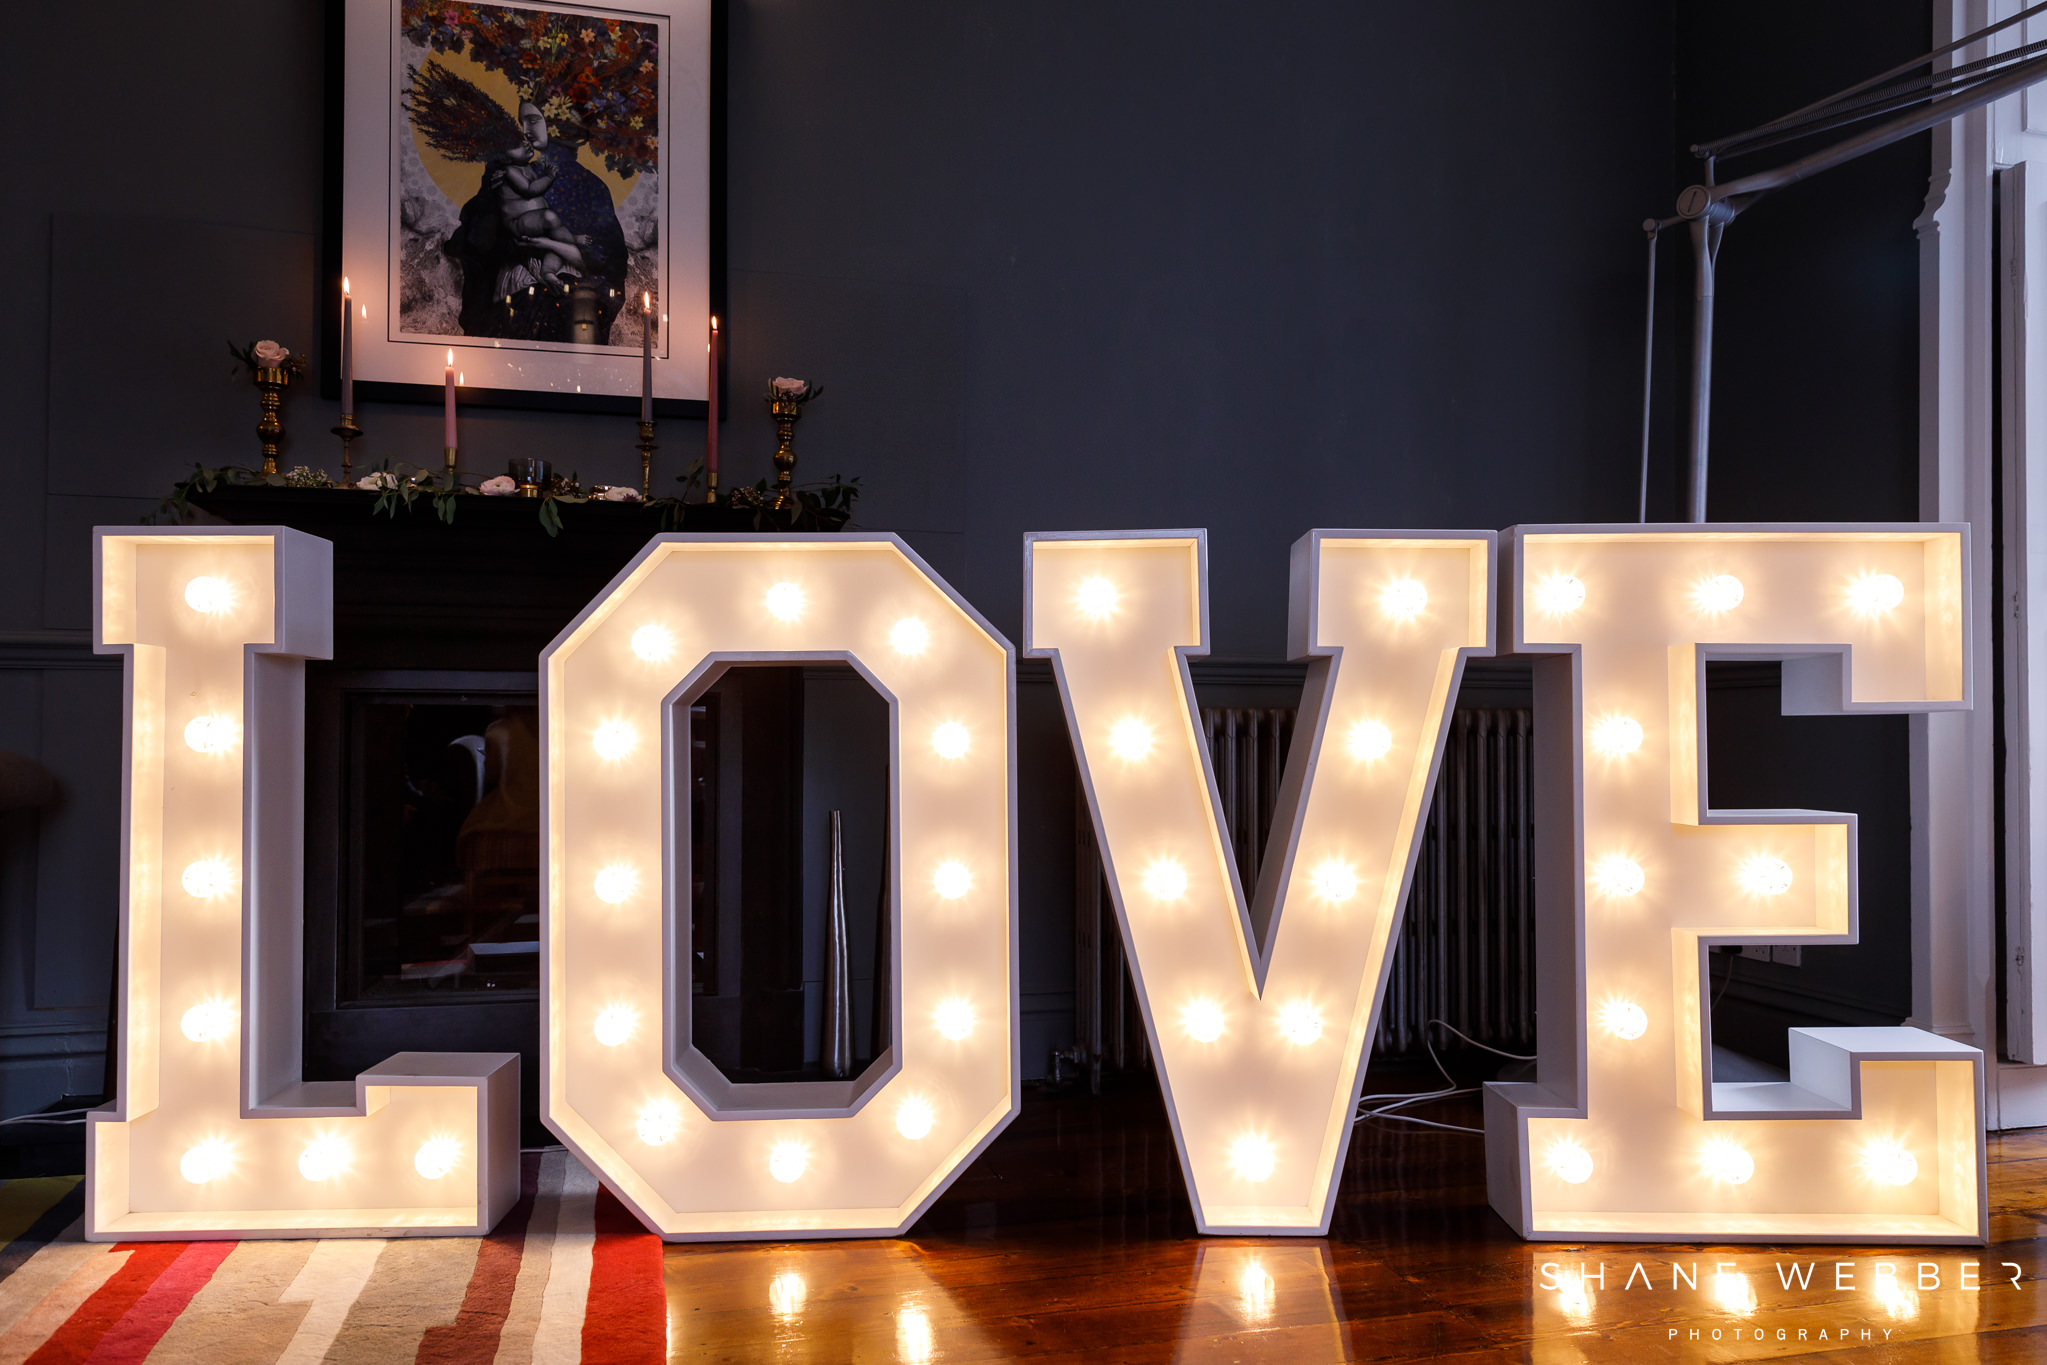 didsbury-house-hotel-wedding-open-day-27th-january-2019-10036.jpg